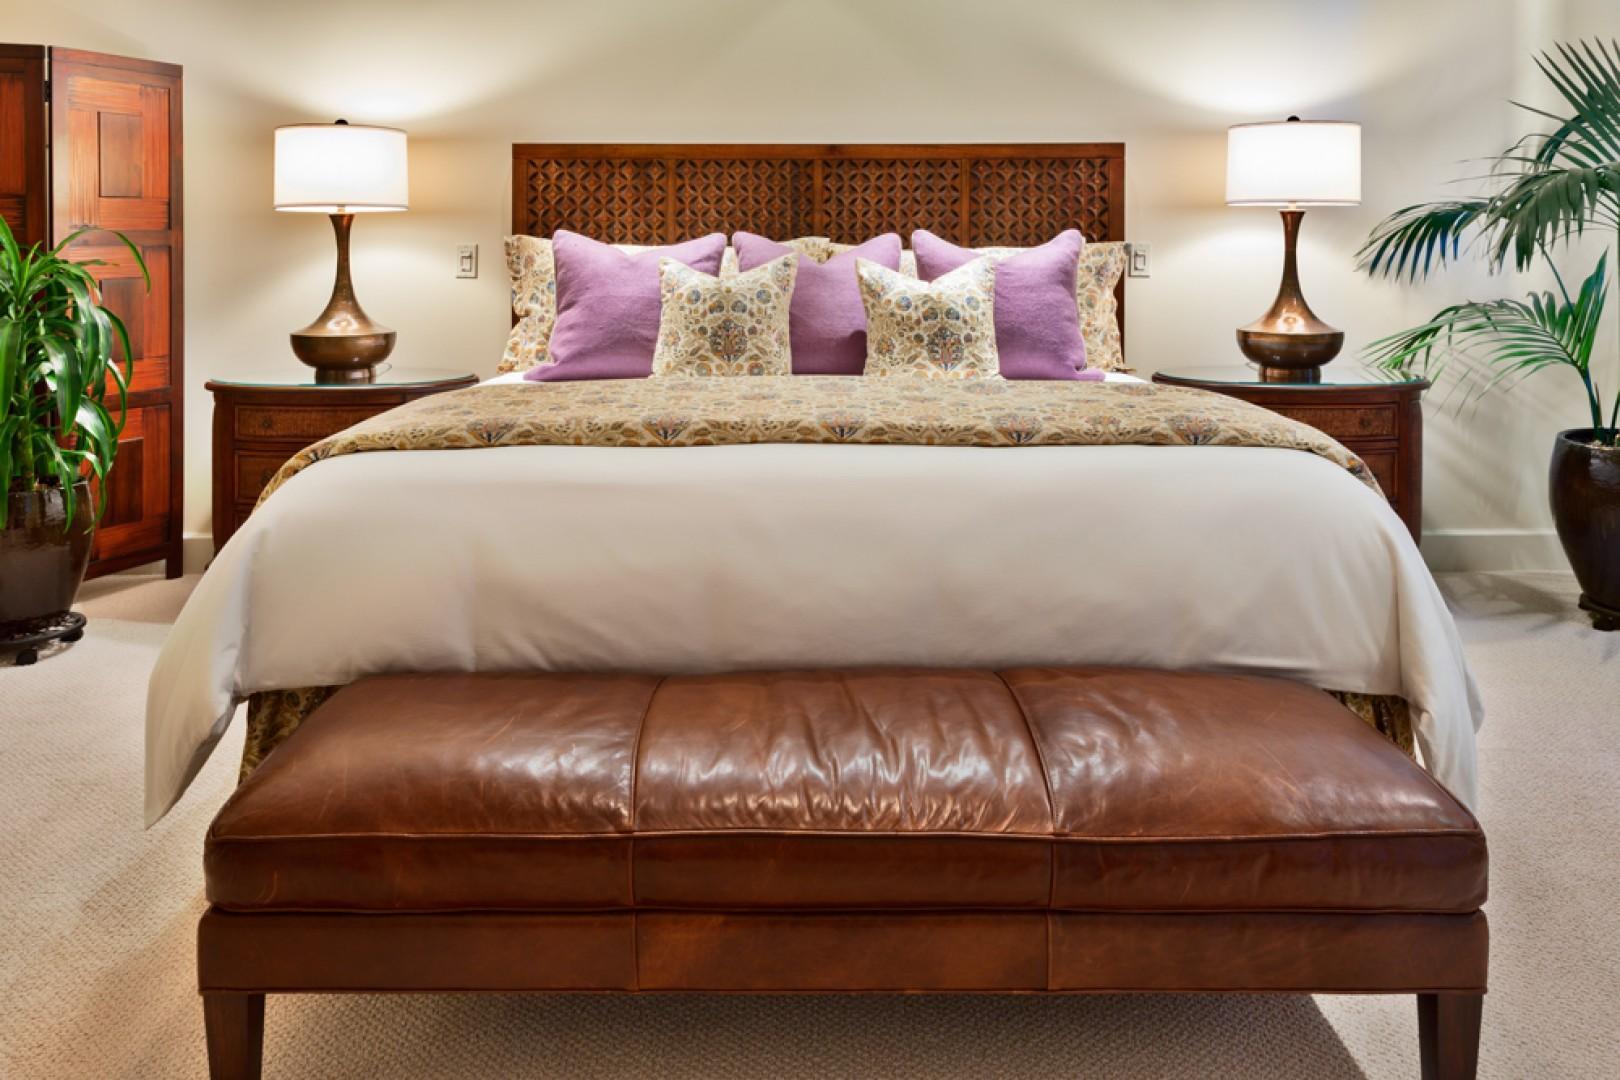 King bed in master bedroom.